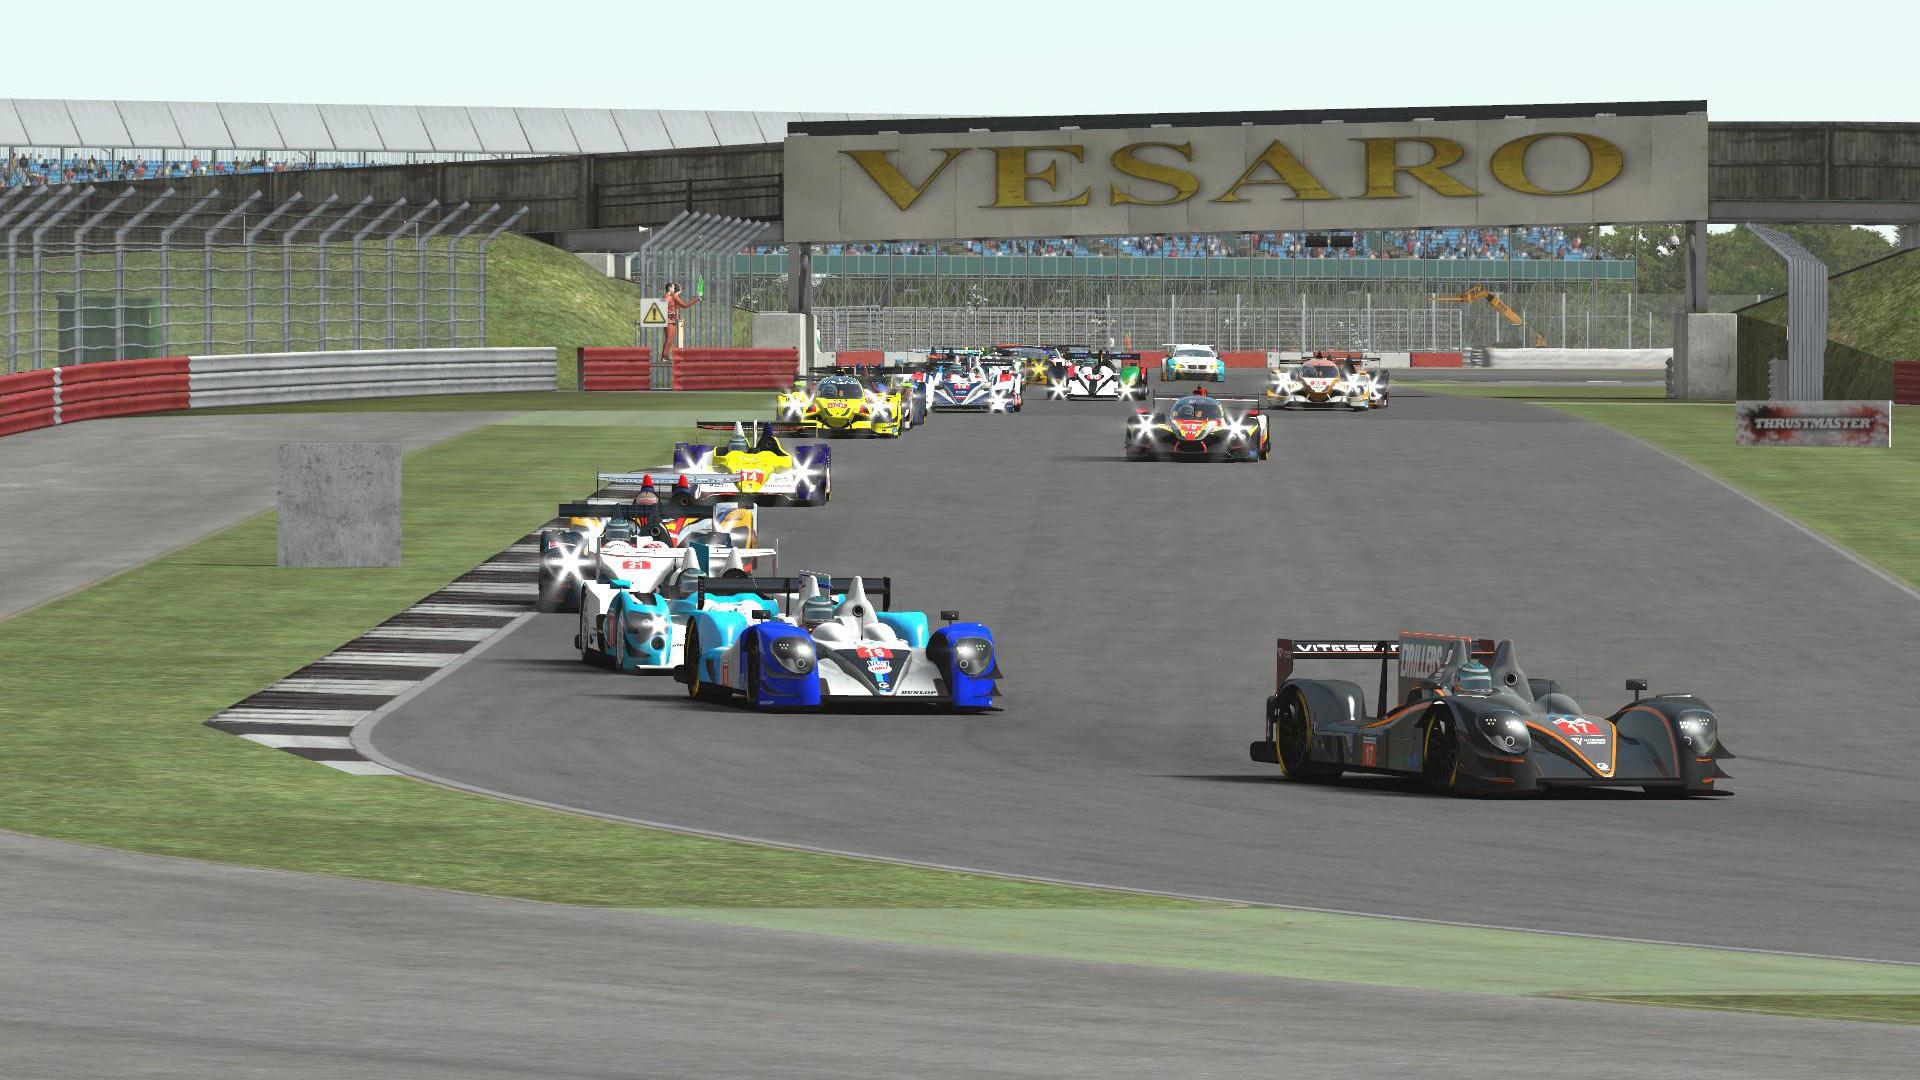 RDLMS by Vesaro - Silverstone - Round 2 e.jpg